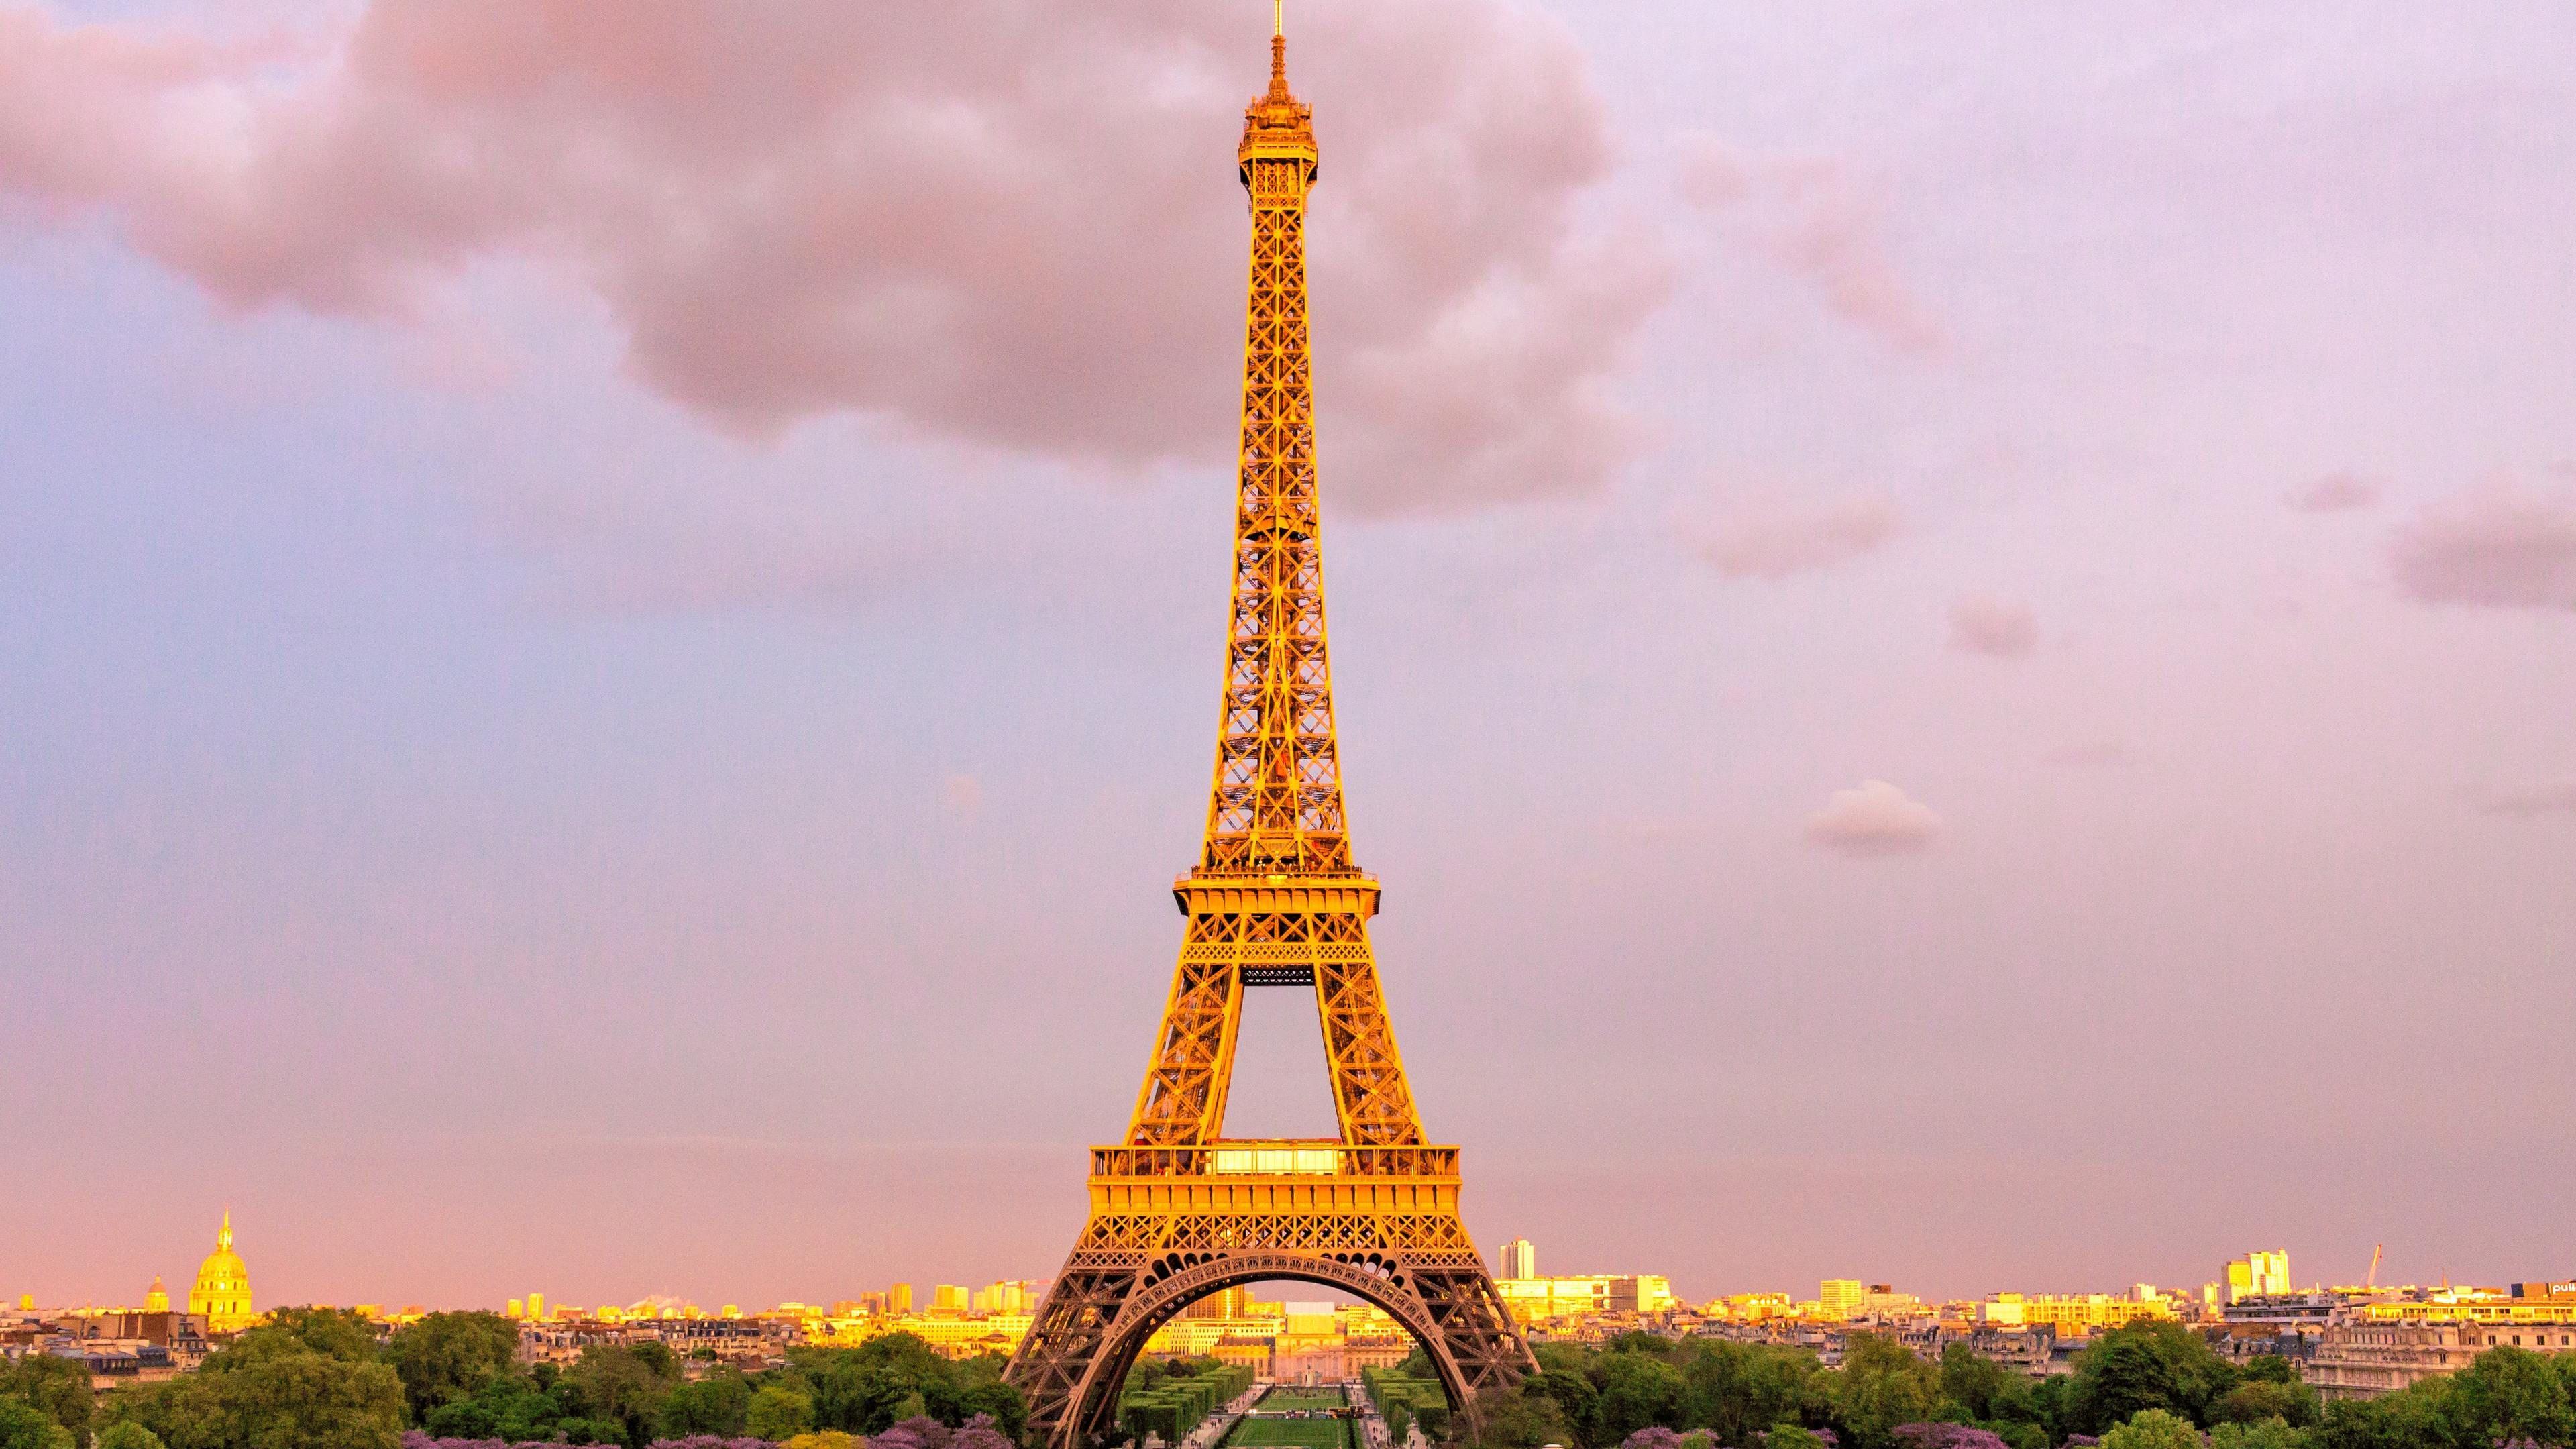 Eiffel Tower In Paris World Wallpapers Paris Wallpapers Hd Wallpapers France Wallpapers Eiffel Tower Wallp Eiffel Tower France Wallpaper Paris Eiffel Tower Eiffel tower wallpaper hd download